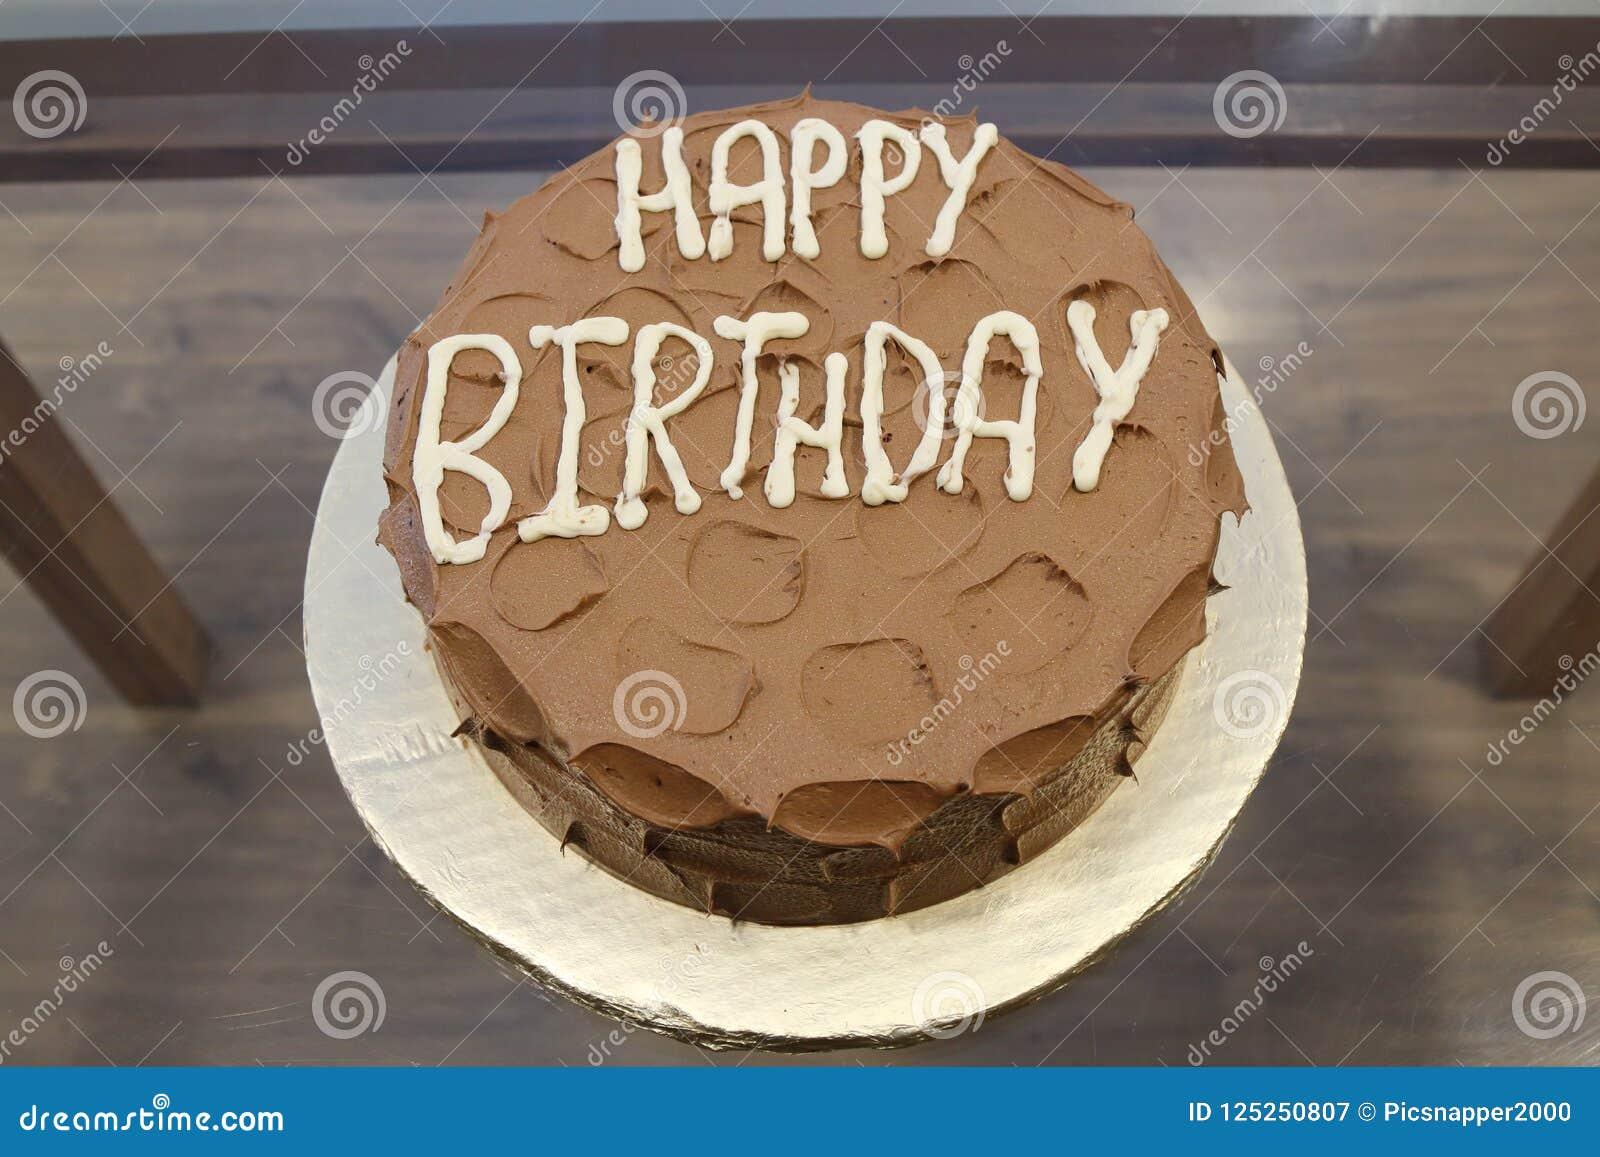 Enjoyable Chocolate Cake In Medium Brown Happy Birthday Text In White Stock Birthday Cards Printable Benkemecafe Filternl